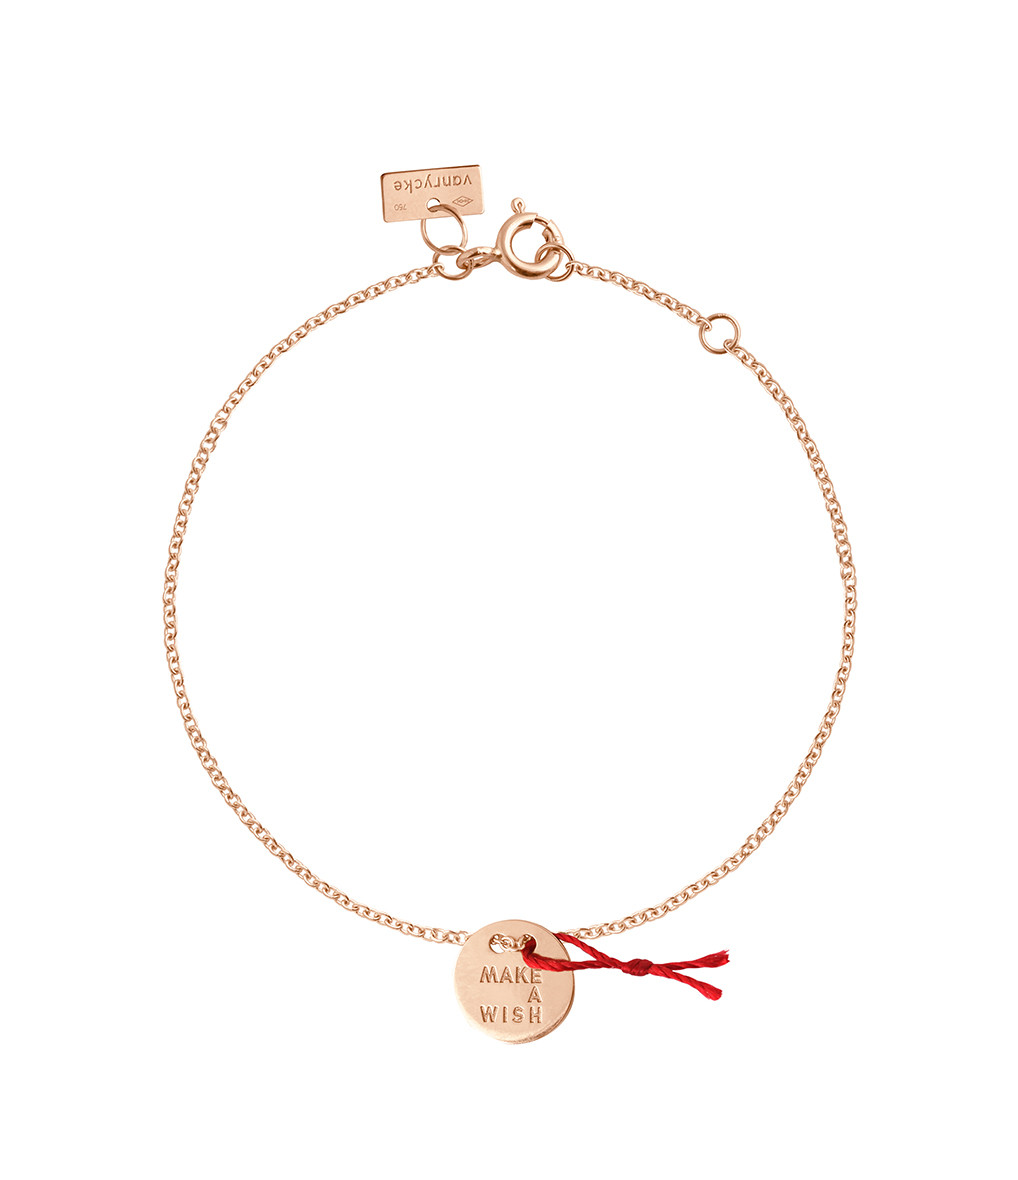 VANRYCKE - Bracelet Make a Wish Or Rose